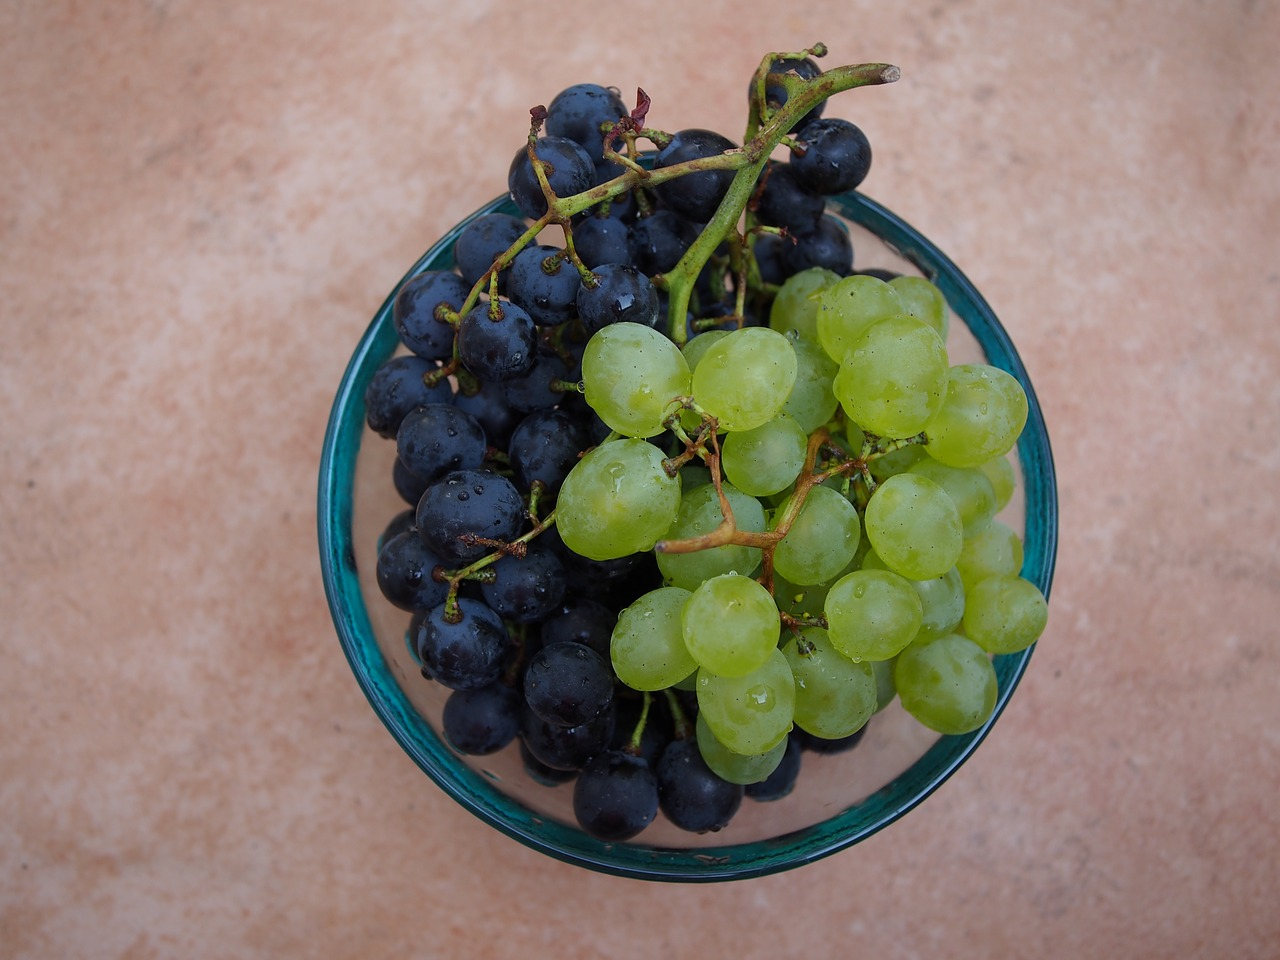 Blueberry dan Anggur Merah Dapat Meningkatkan Imunitas